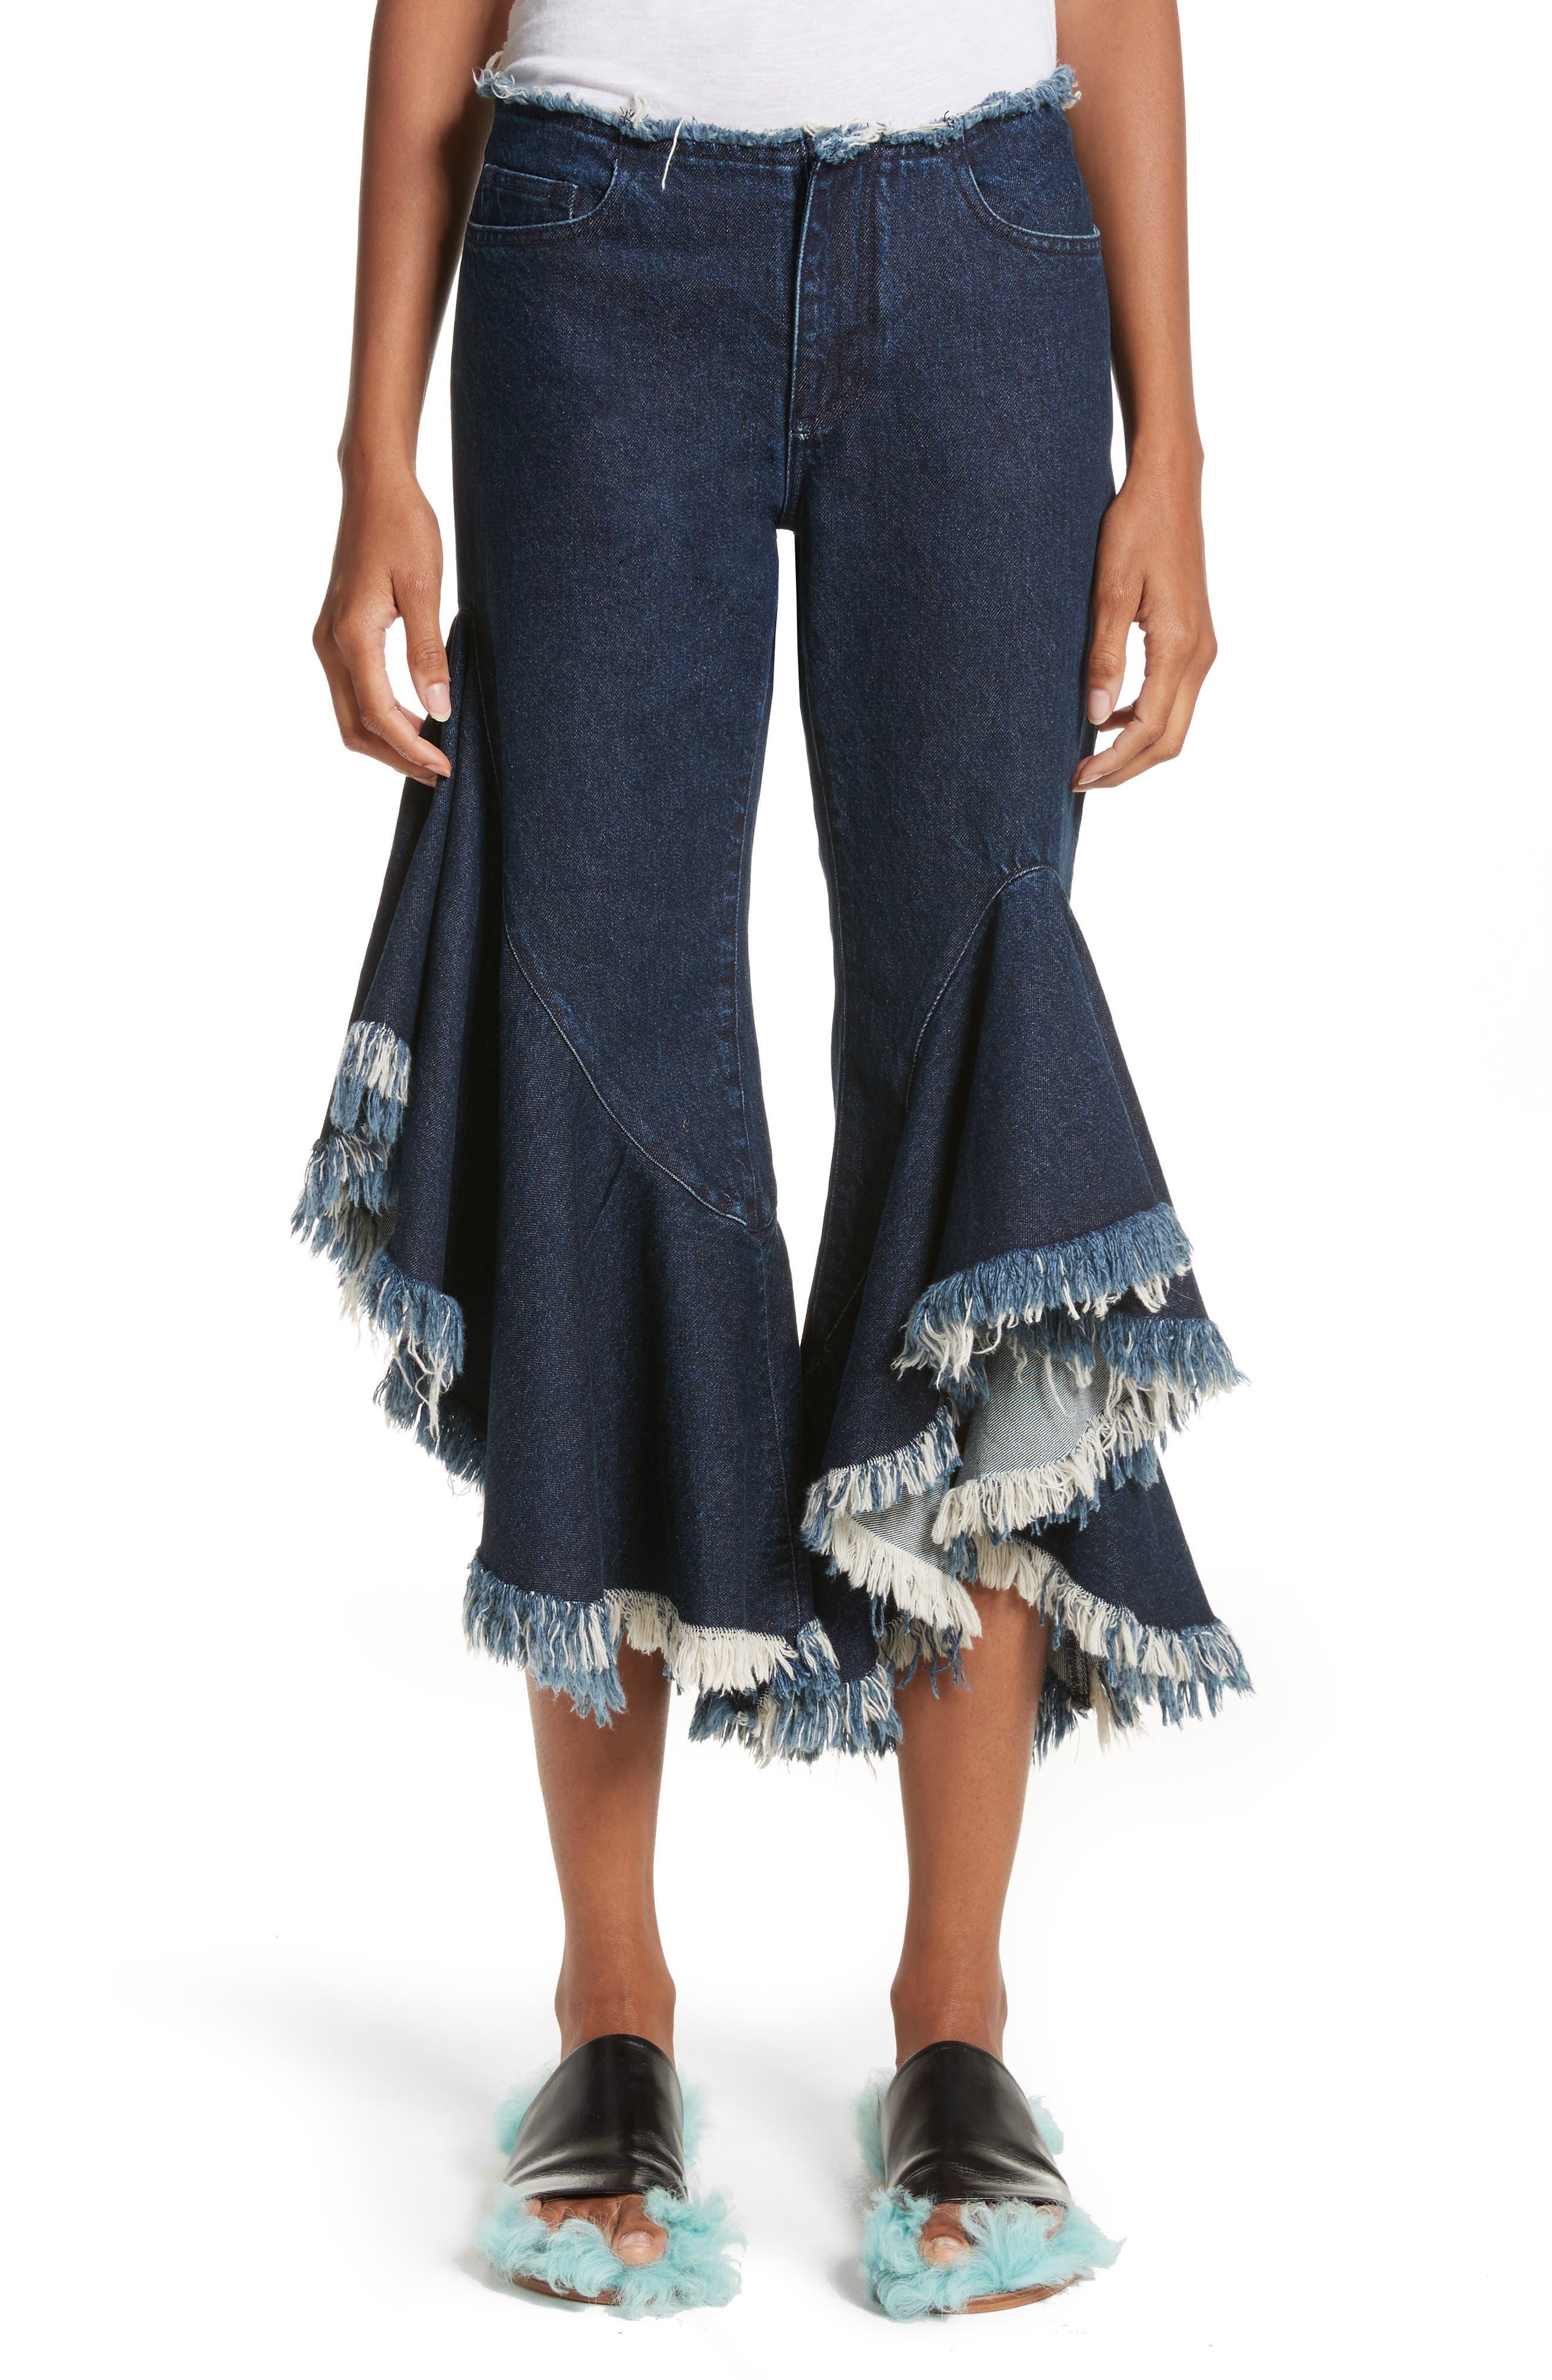 Marques'Almeida Frill Flare Crop Jeans,                             Main thumbnail 1, color,                             400